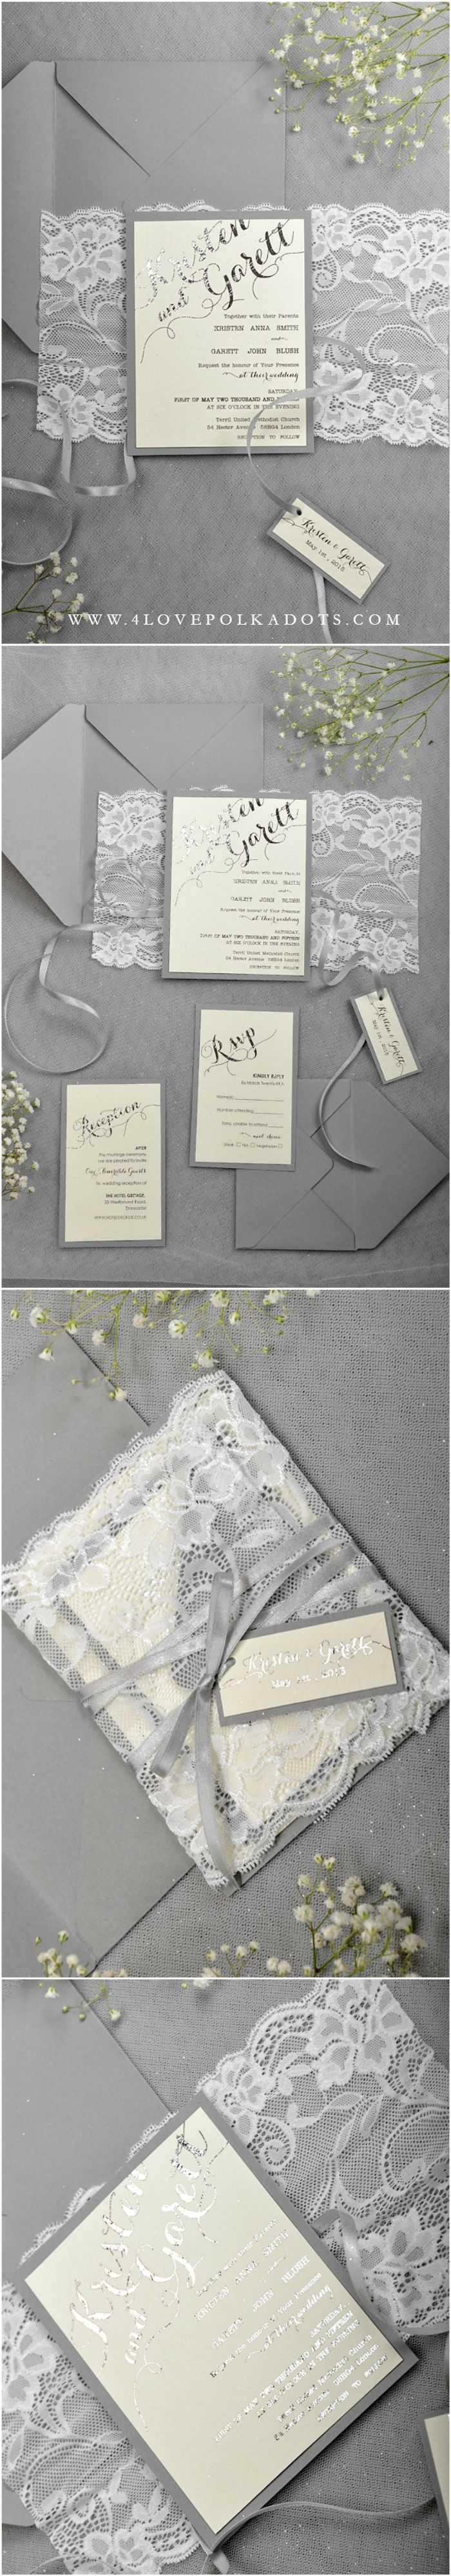 Silver & White Lace Wedding Invitation #lace #romantic #elegant #silverwedding #weddingideas